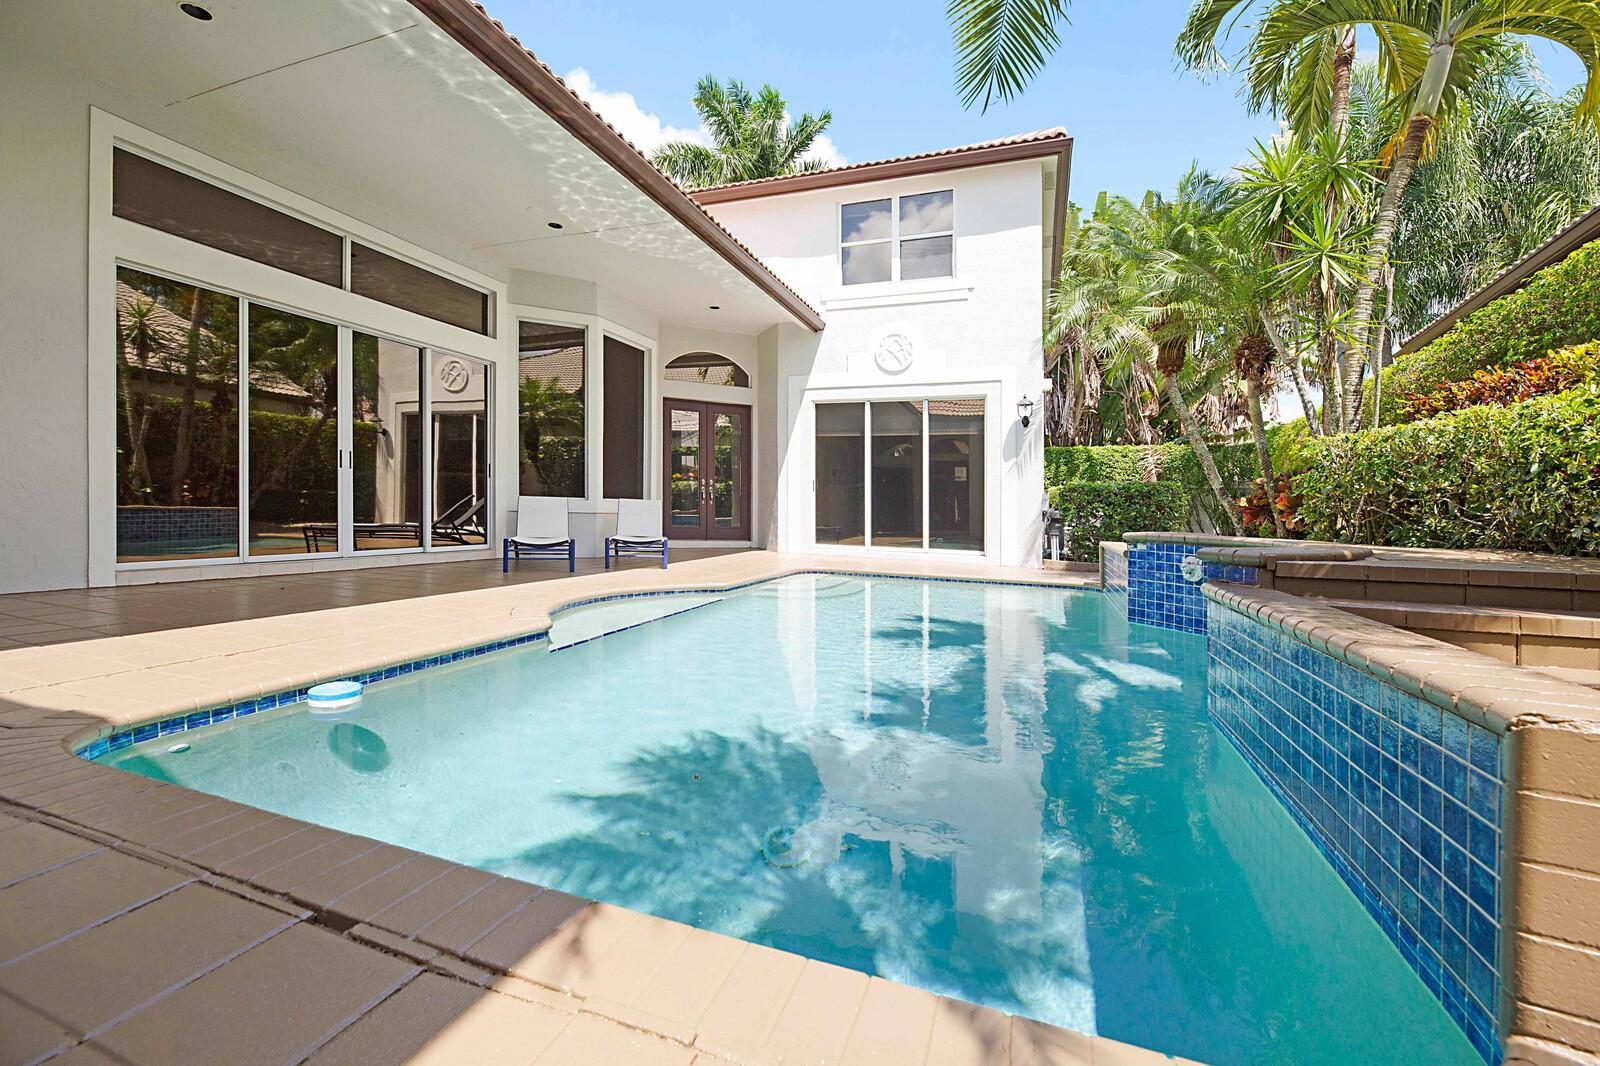 3374 Nw 53rd Circle, Boca Raton, FL 33496